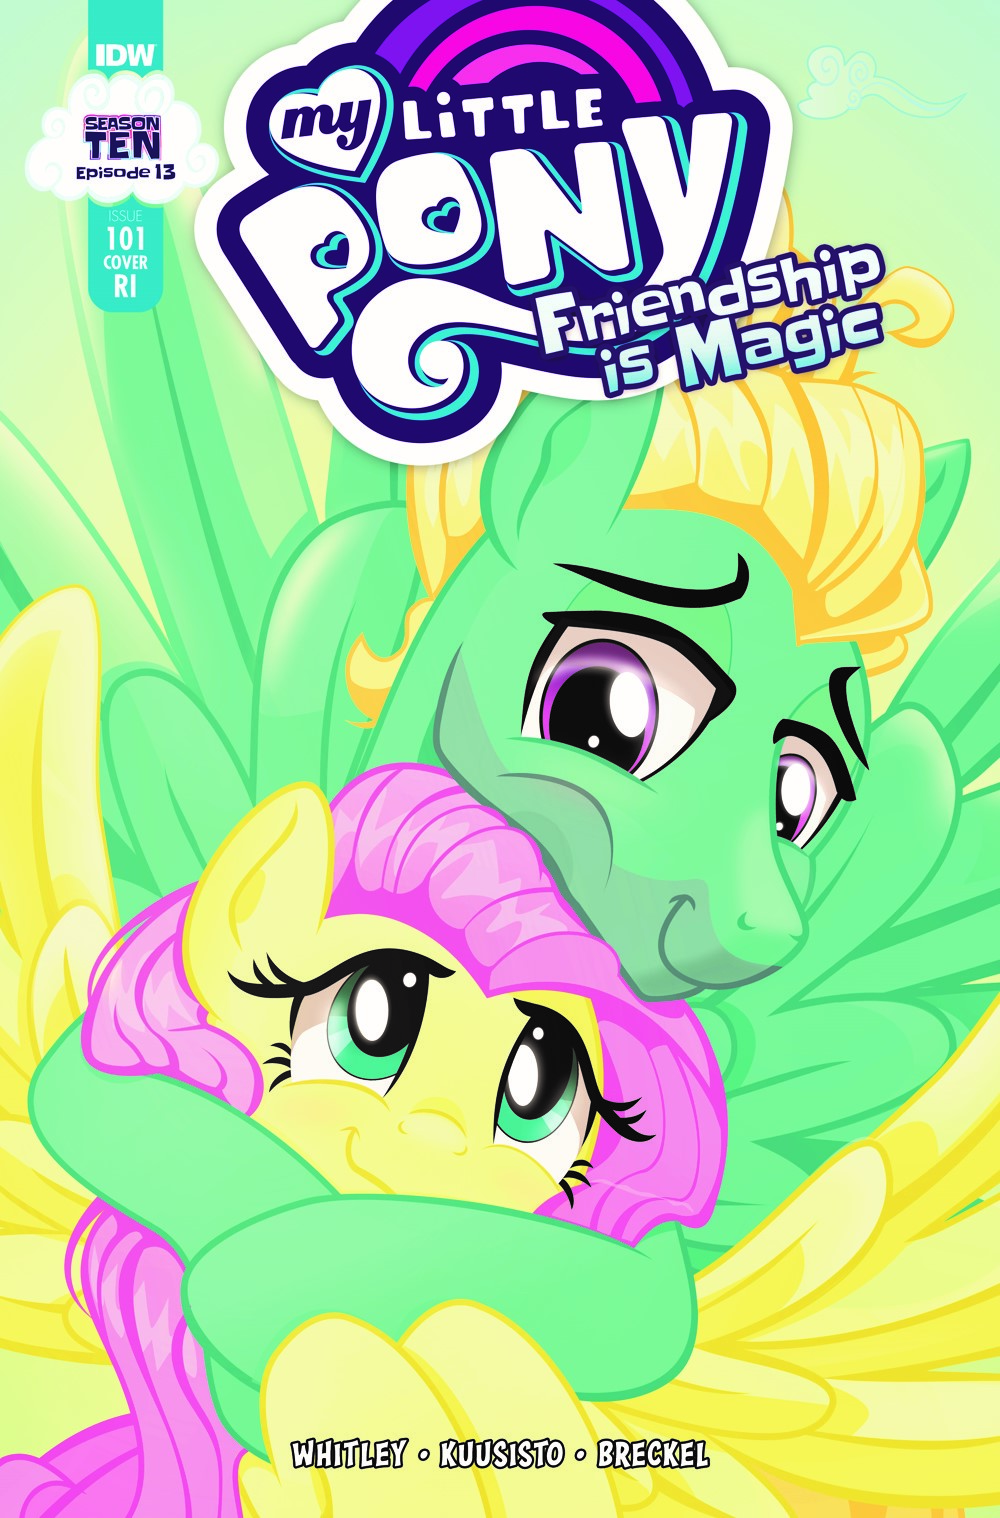 MLP101_13-coverRI ComicList Previews: MY LITTLE PONY FRIENDSHIP IS MAGIC #101